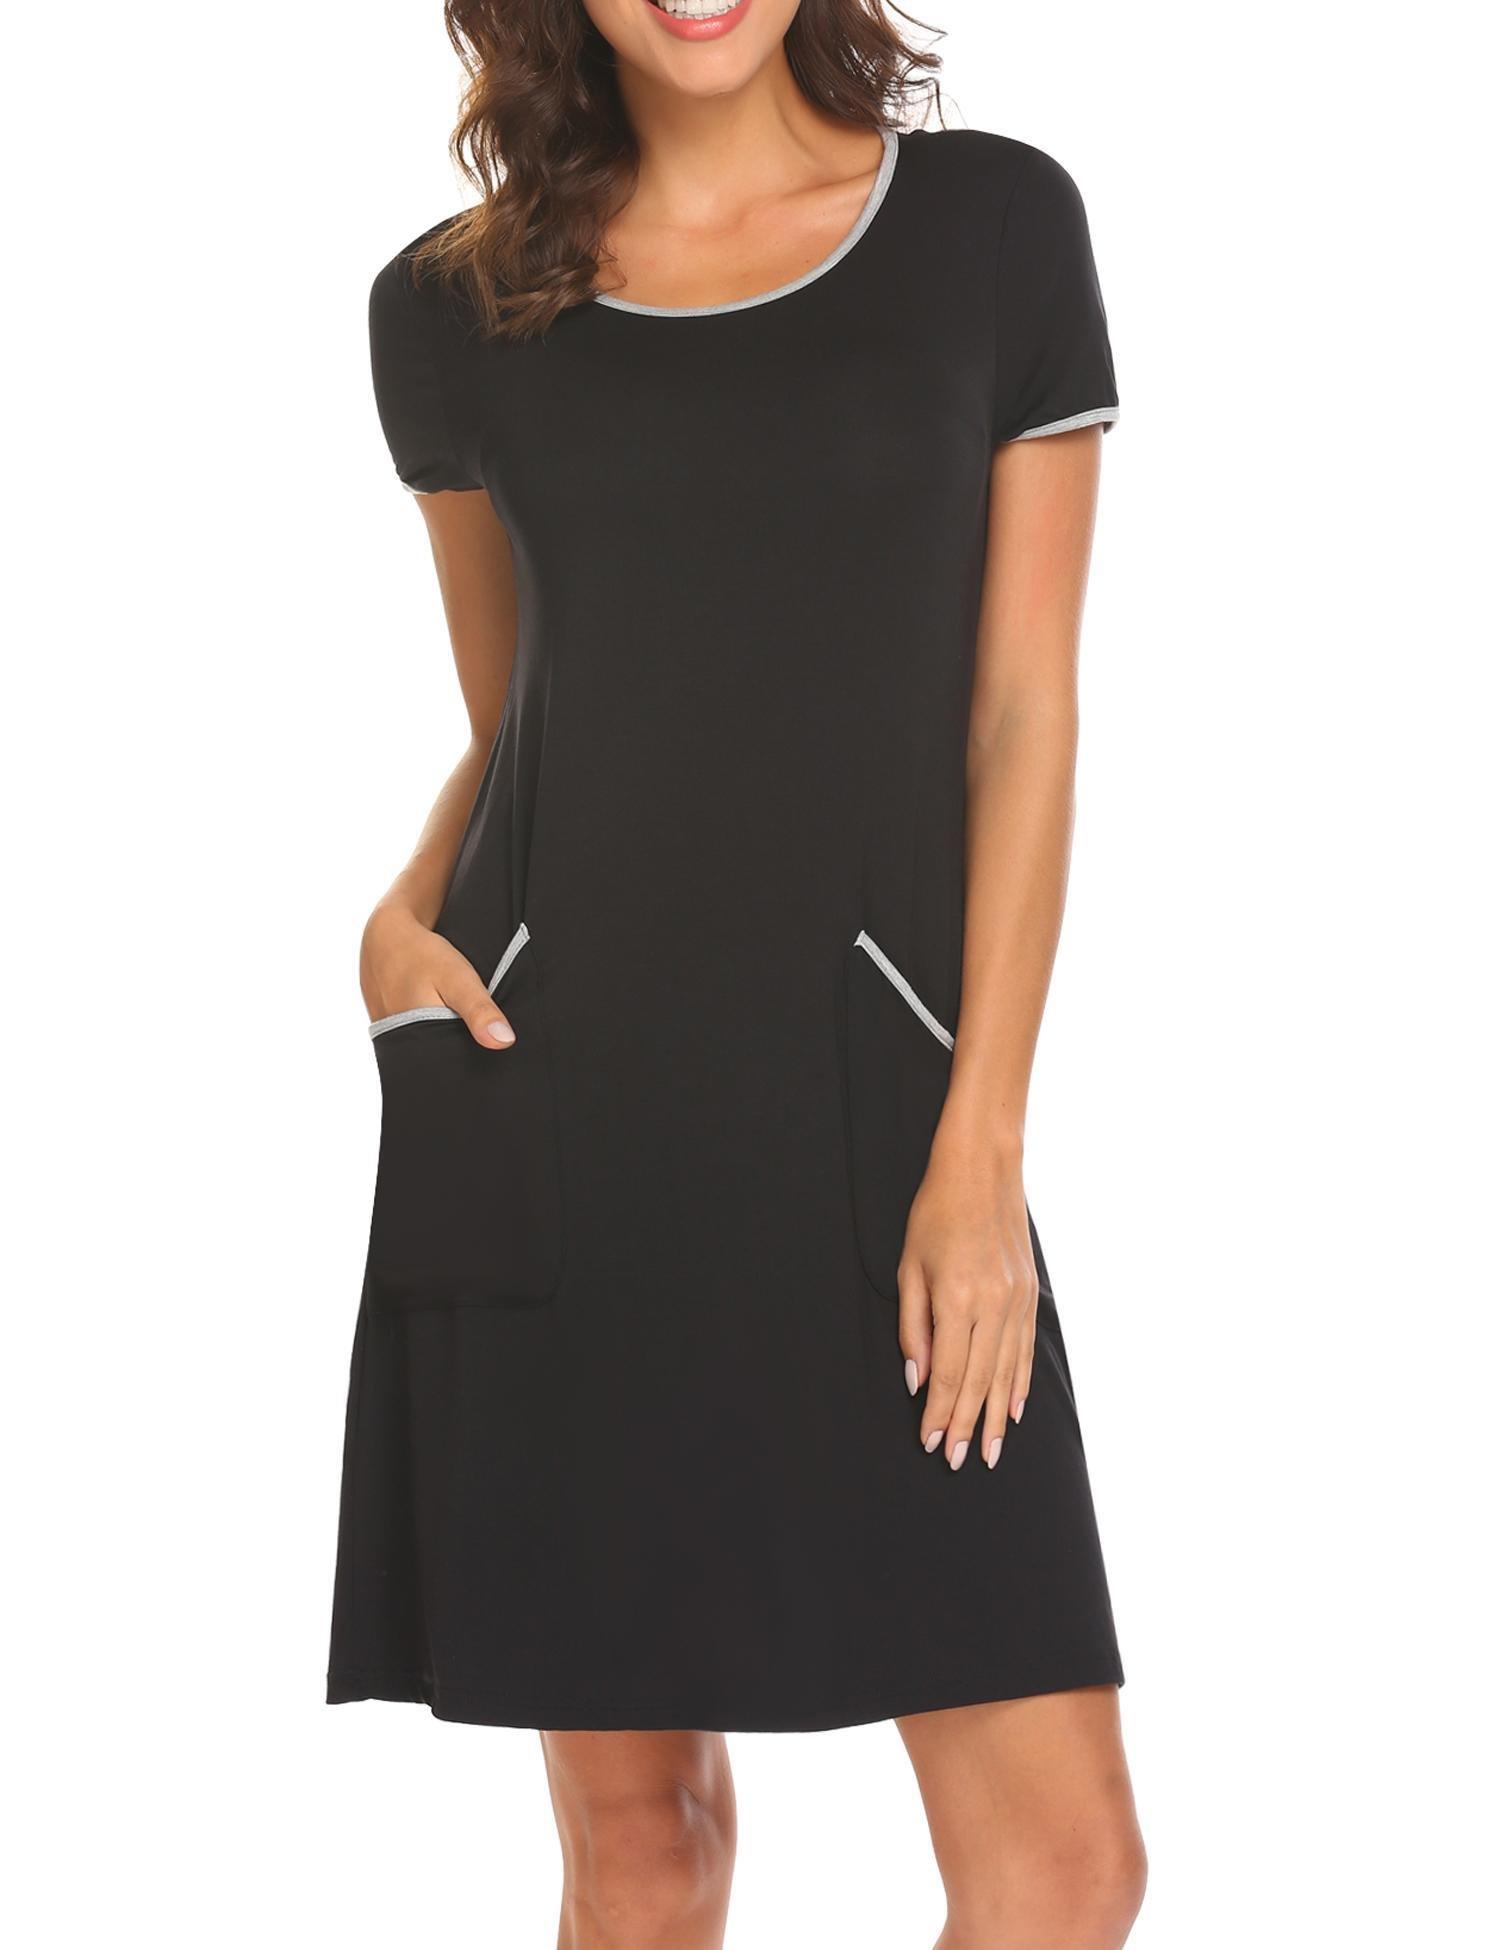 Ekouaer Women's Comfortable Pajama Lounge Loose Fit Sleepwear Short Sleeve Nightshirt (Black XL)